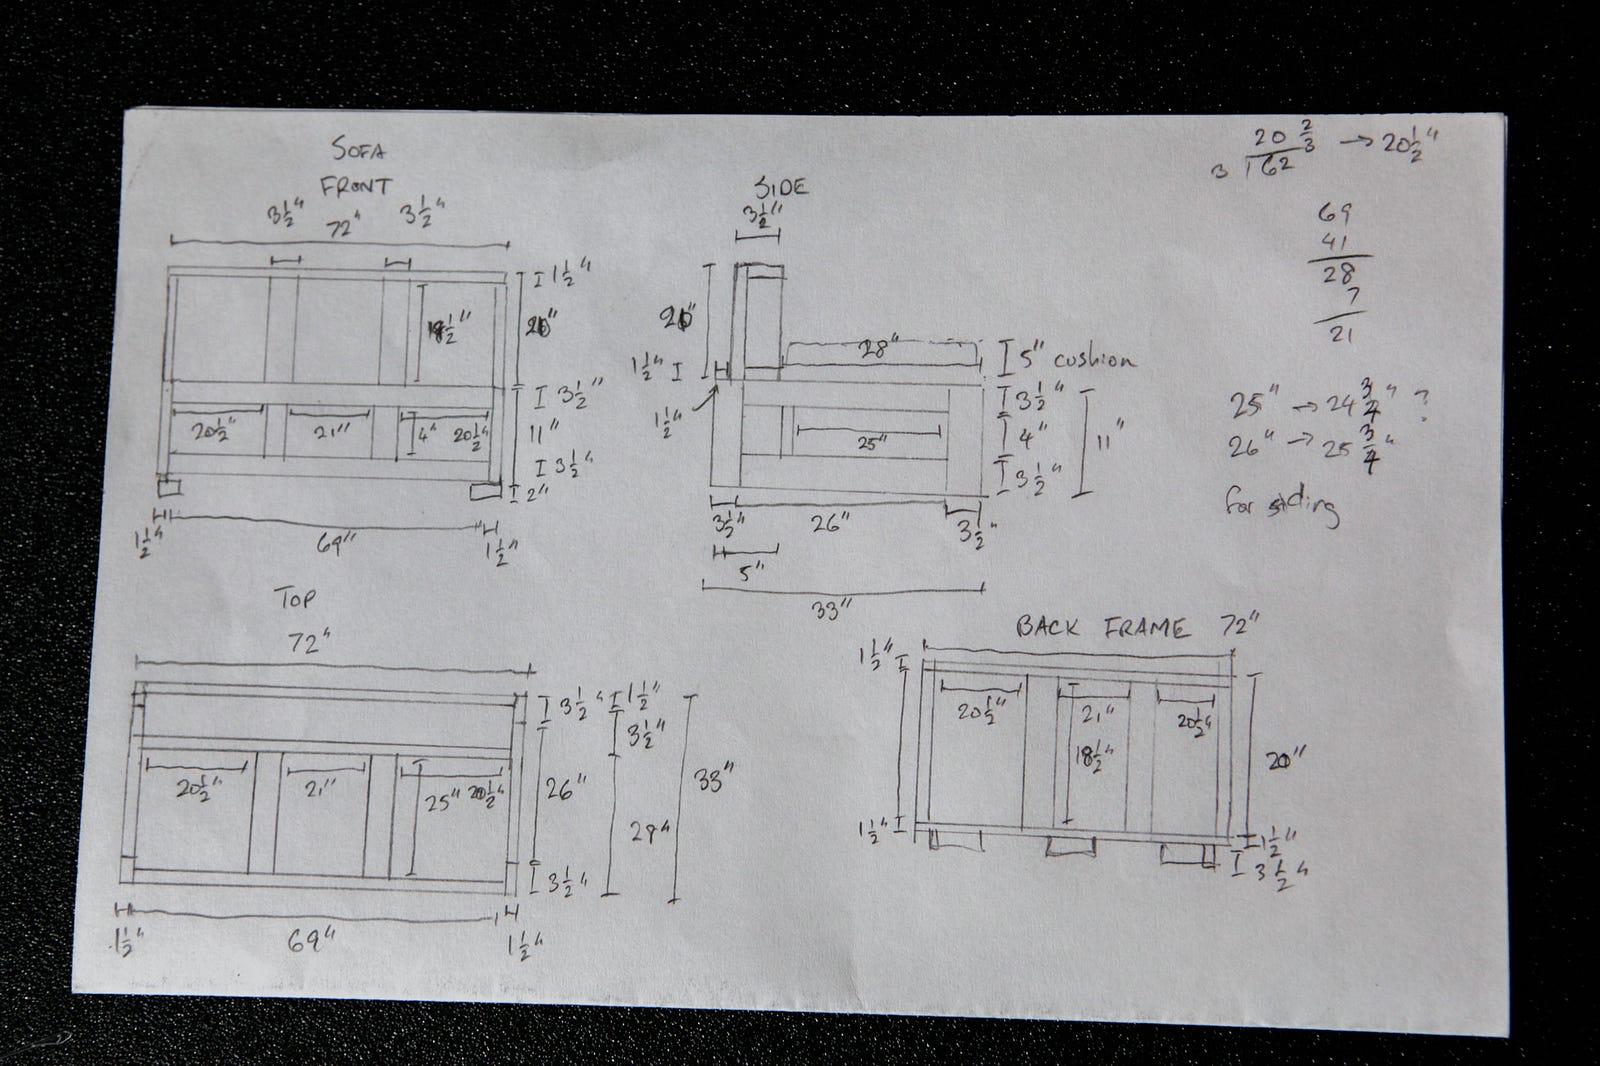 So You Want To Make A Sofa David Hsu Medium